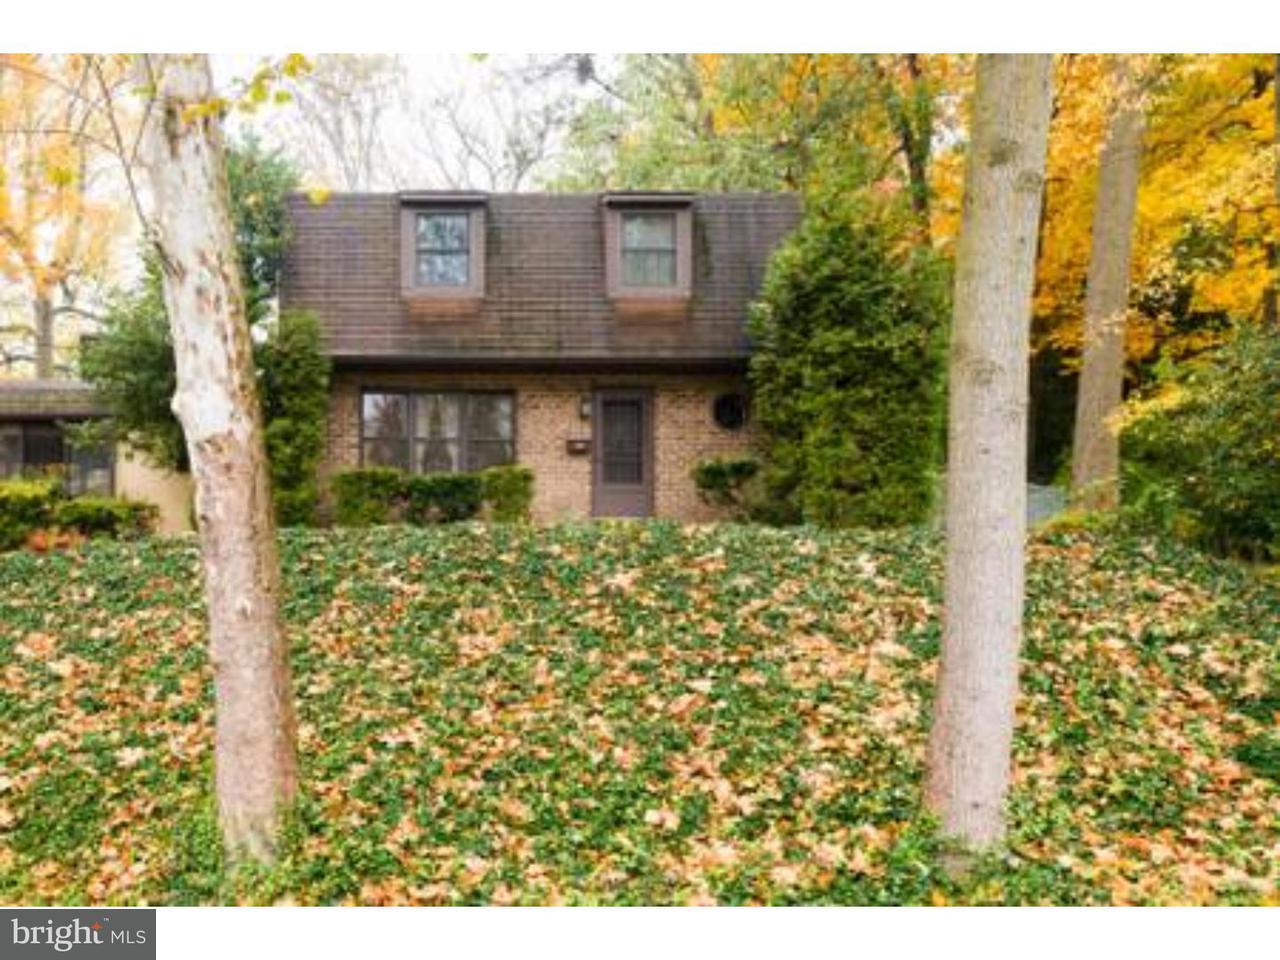 Single Family Home for Sale at 212 ASHURST Avenue Secane, Pennsylvania 19018 United States